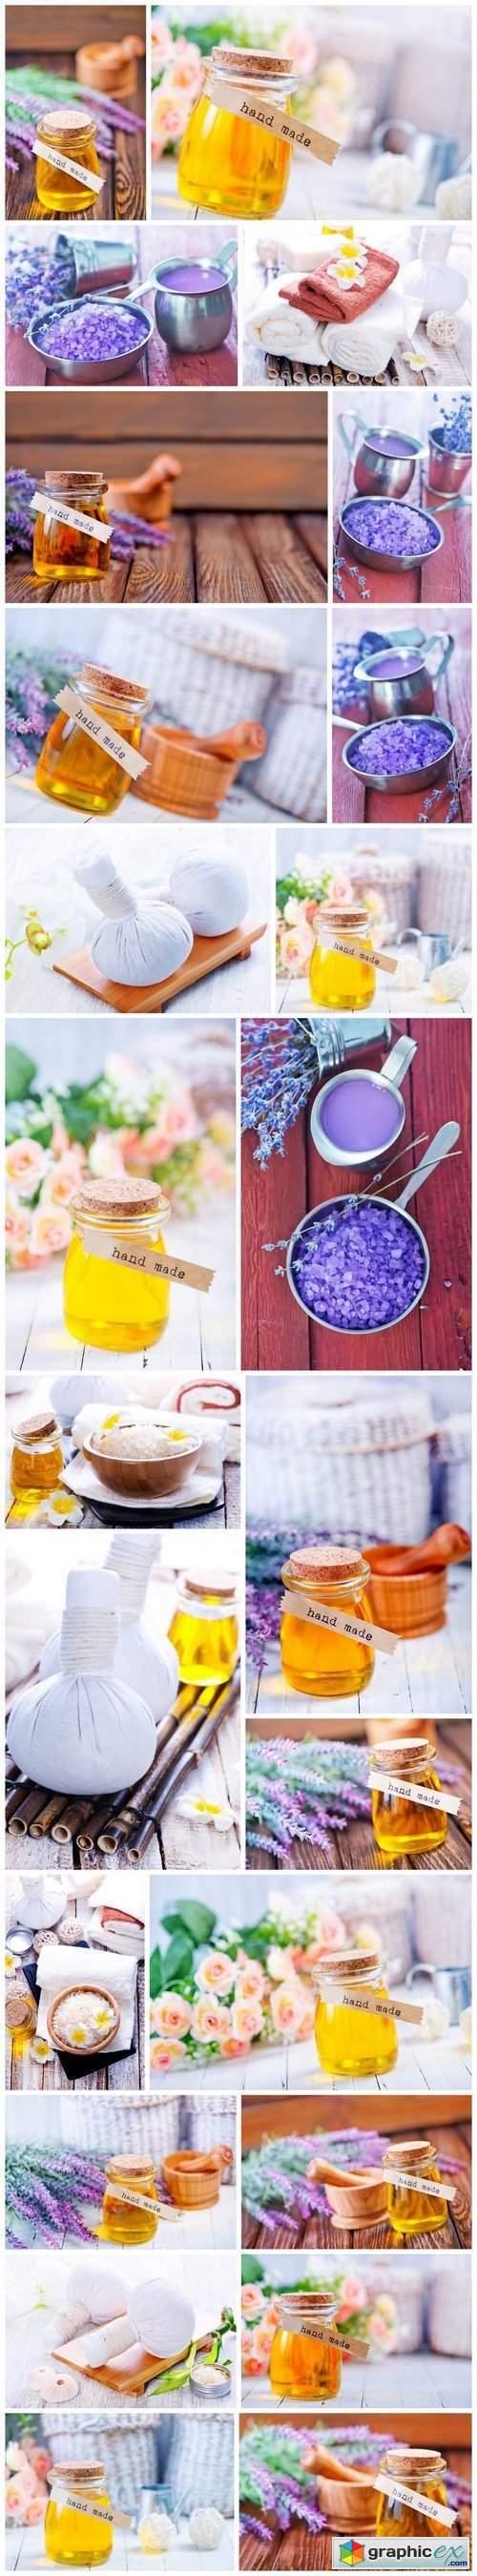 Sea salt, soap, candle and aroma oil 3 - 24xUHQ JPEG